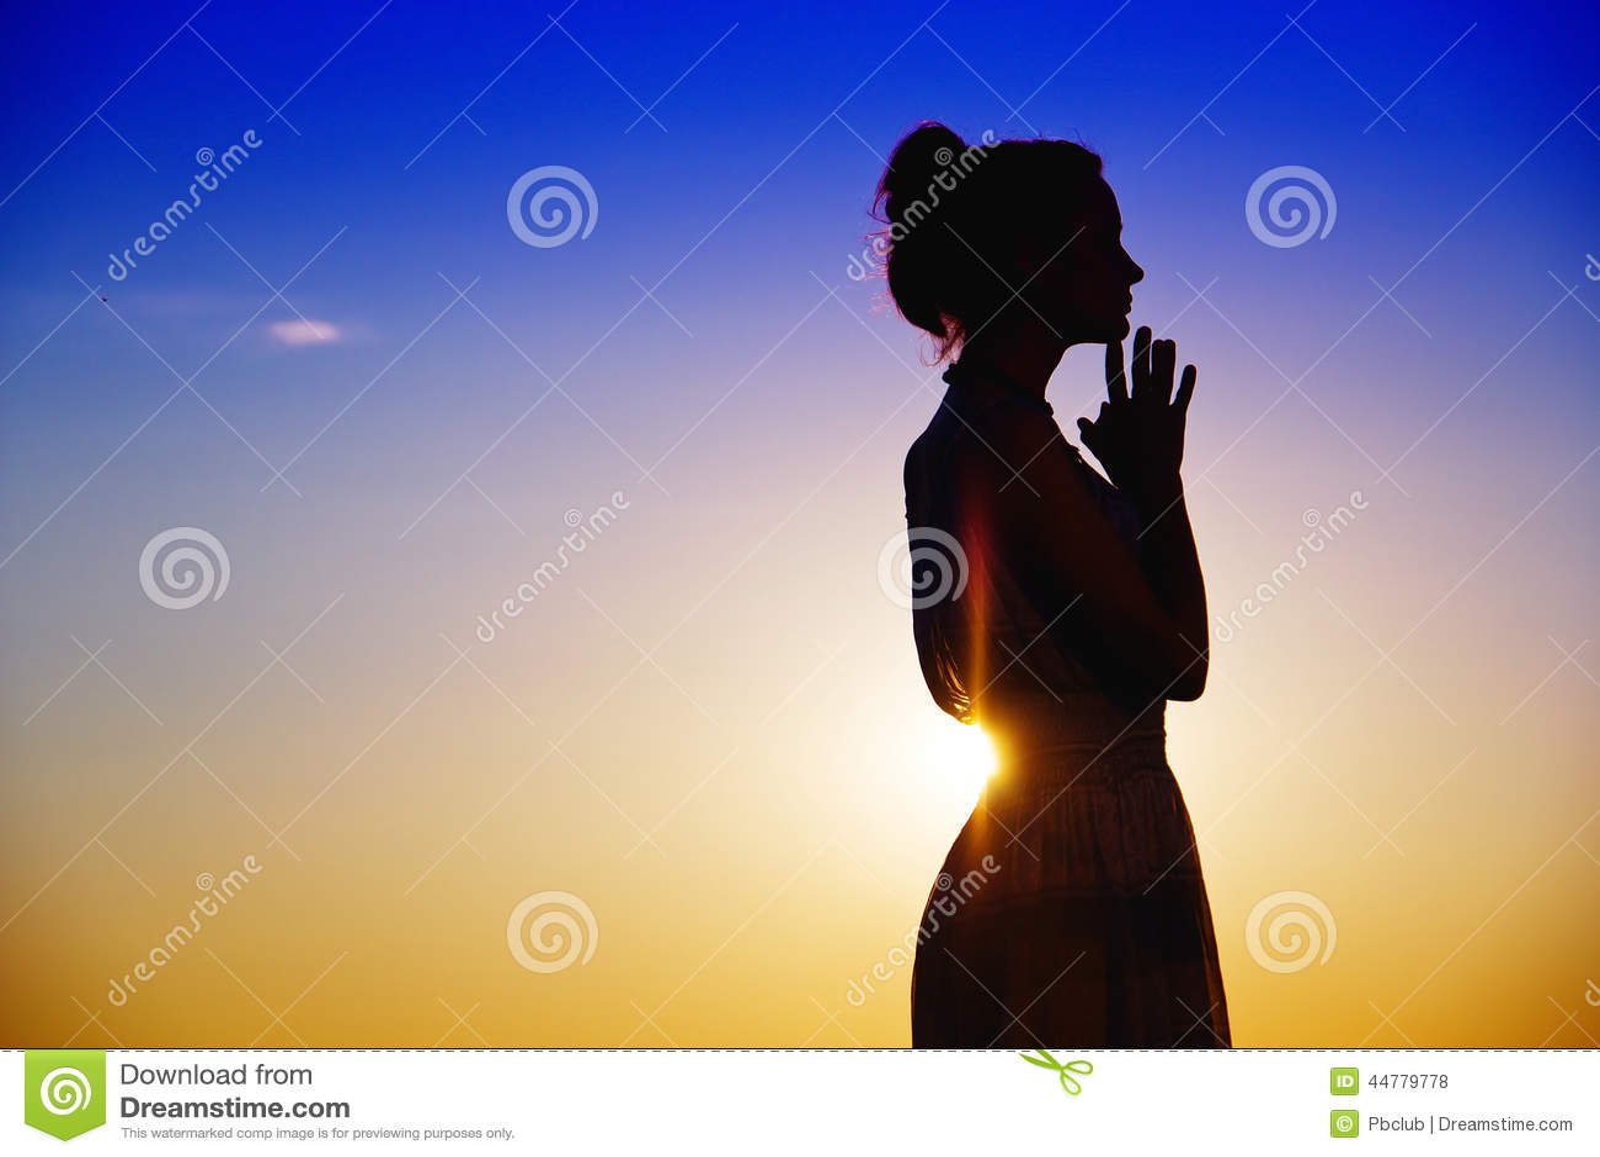 Silhouettierte Frau tief im Gedanken